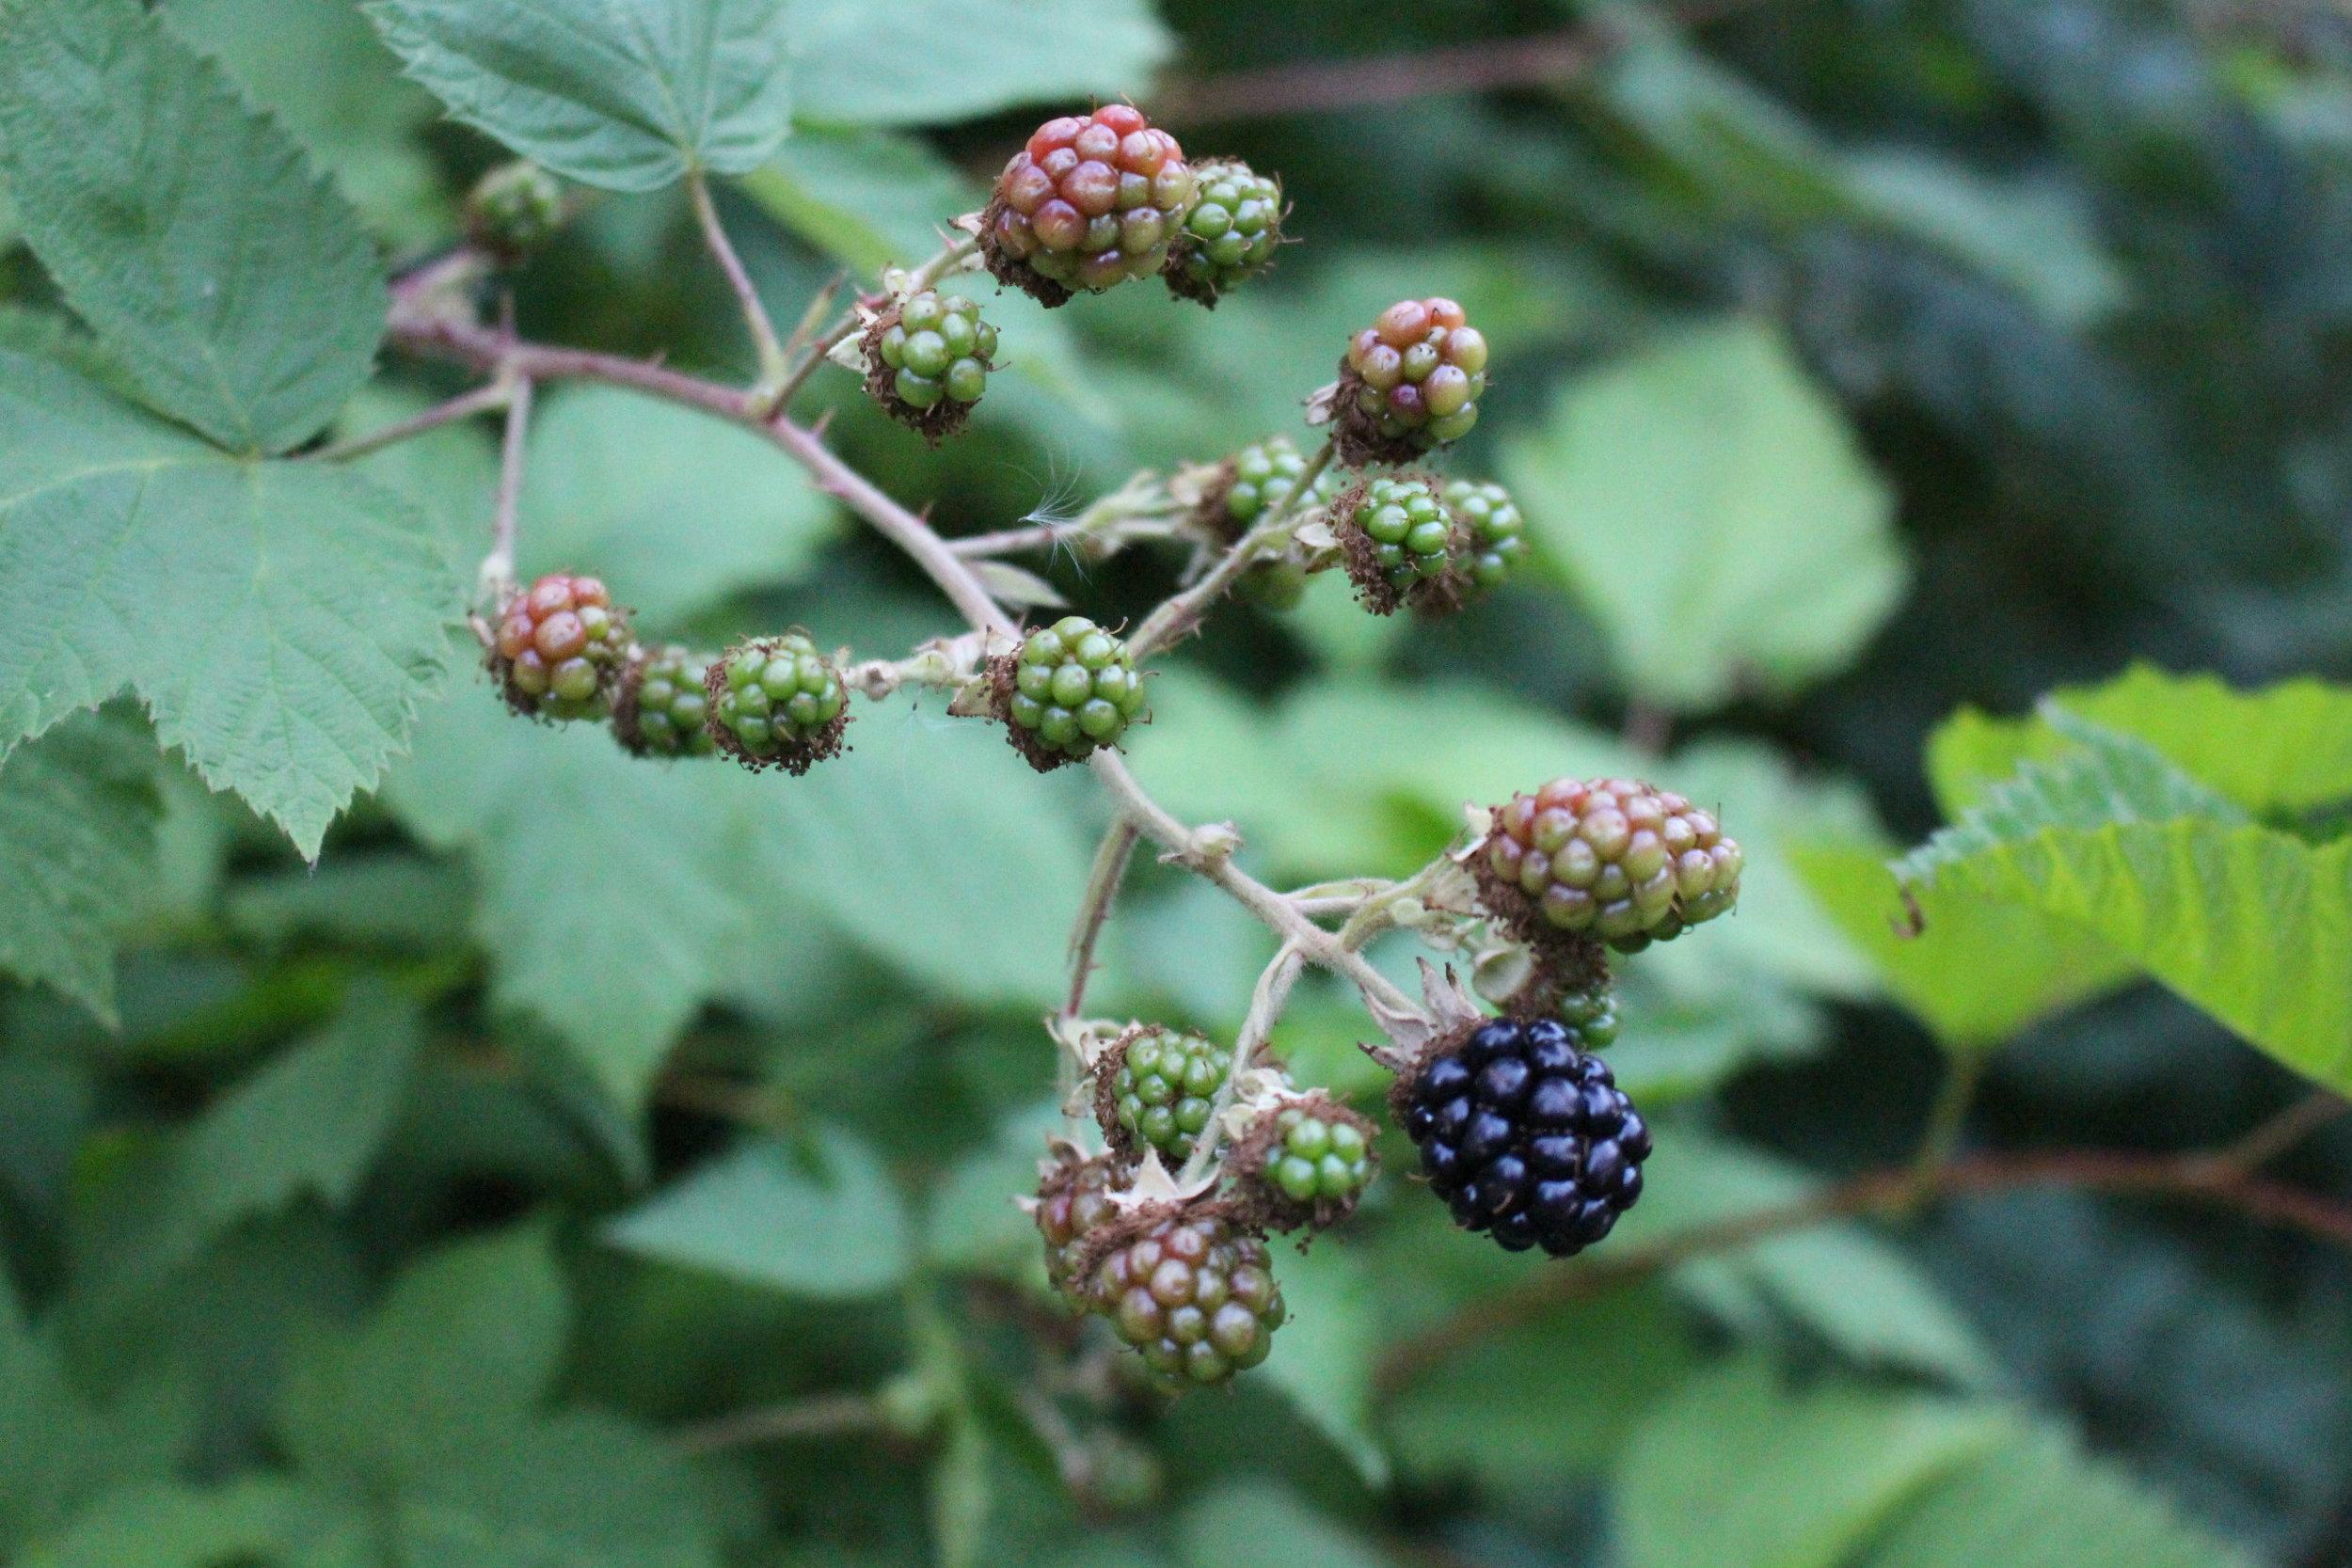 #11 Himalayan Blackberry, Rubus armeniacus